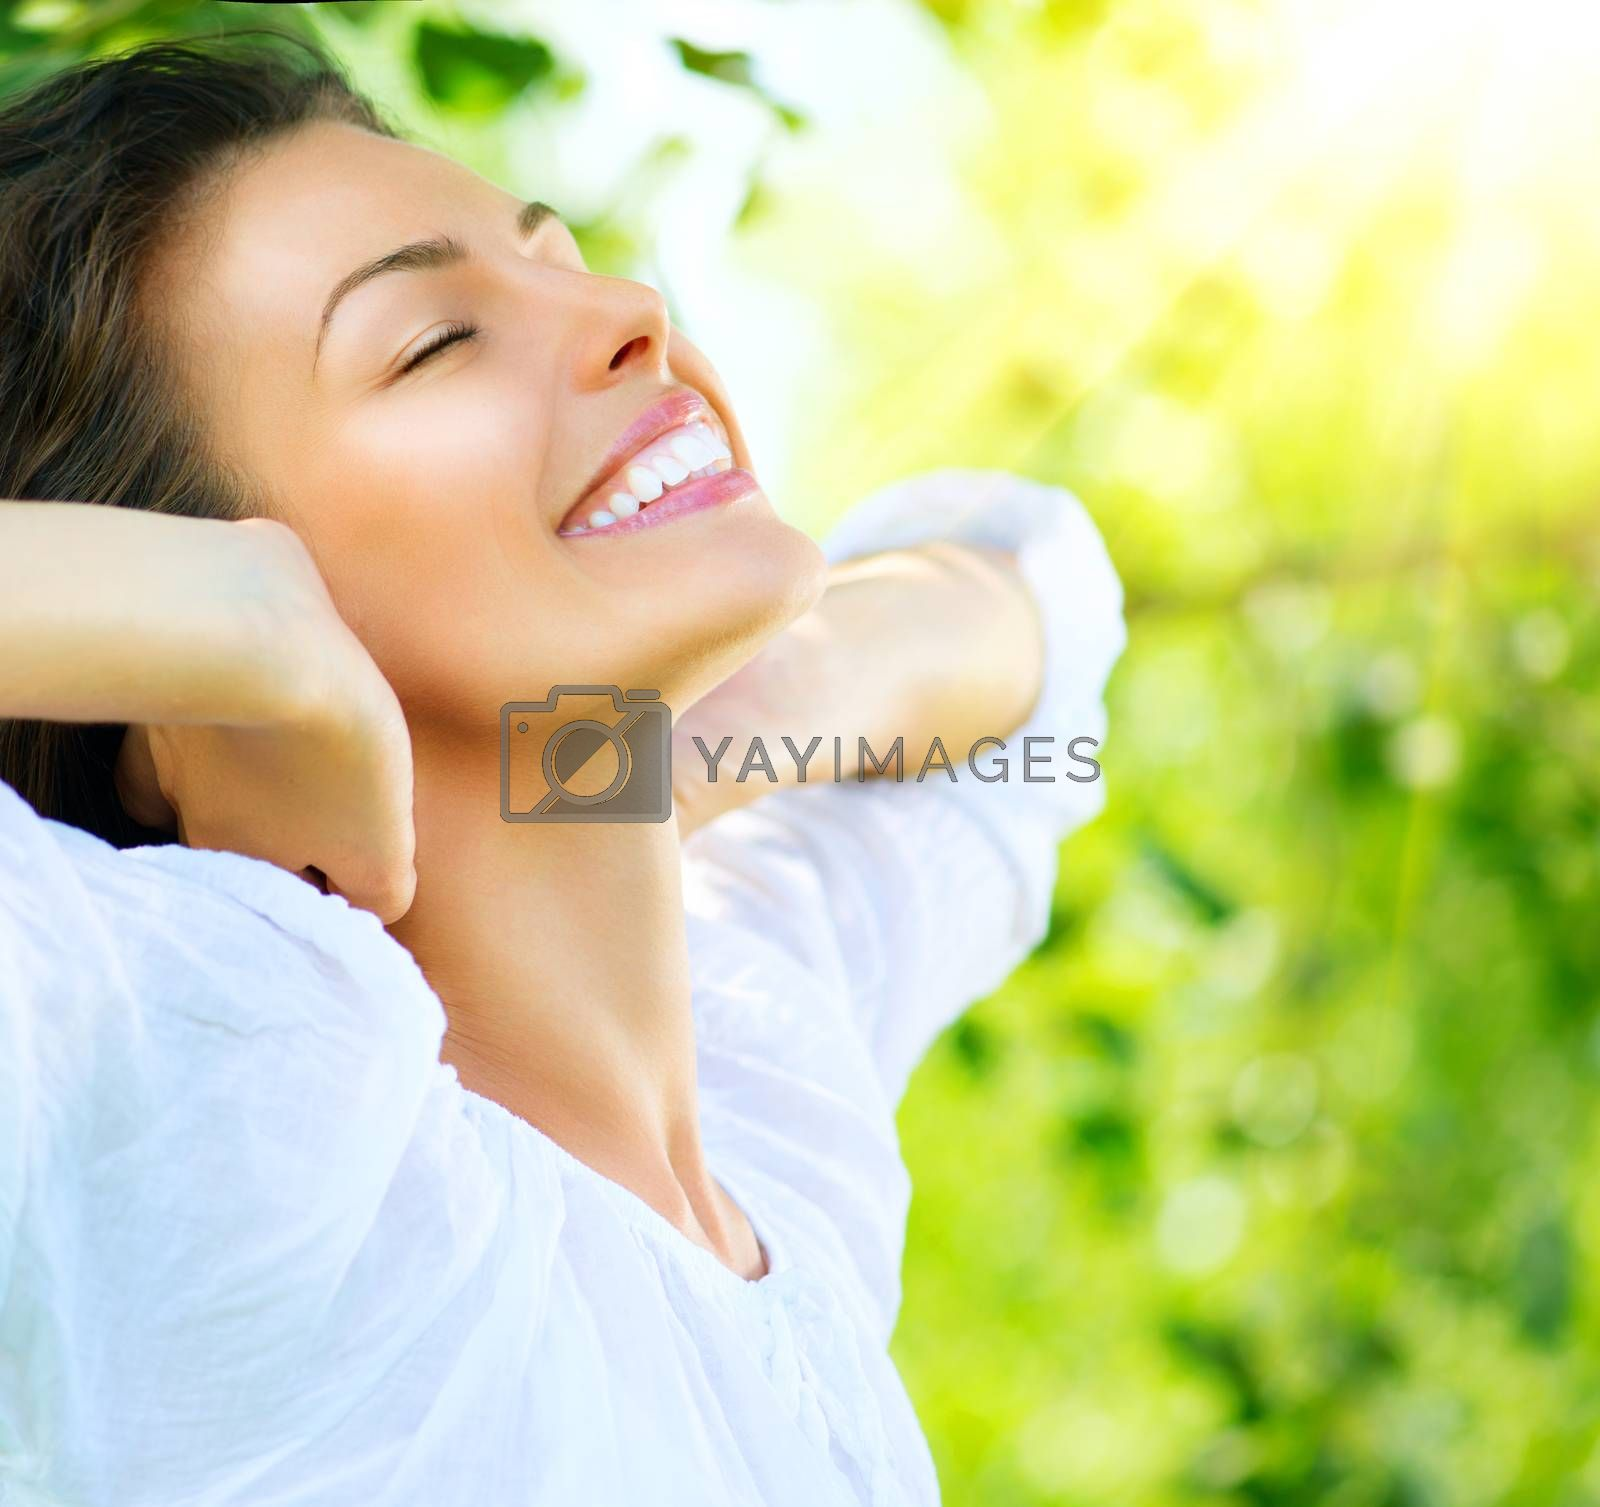 Beautiful Young Woman Outdoor. Enjoy Nature by SubbotinaA